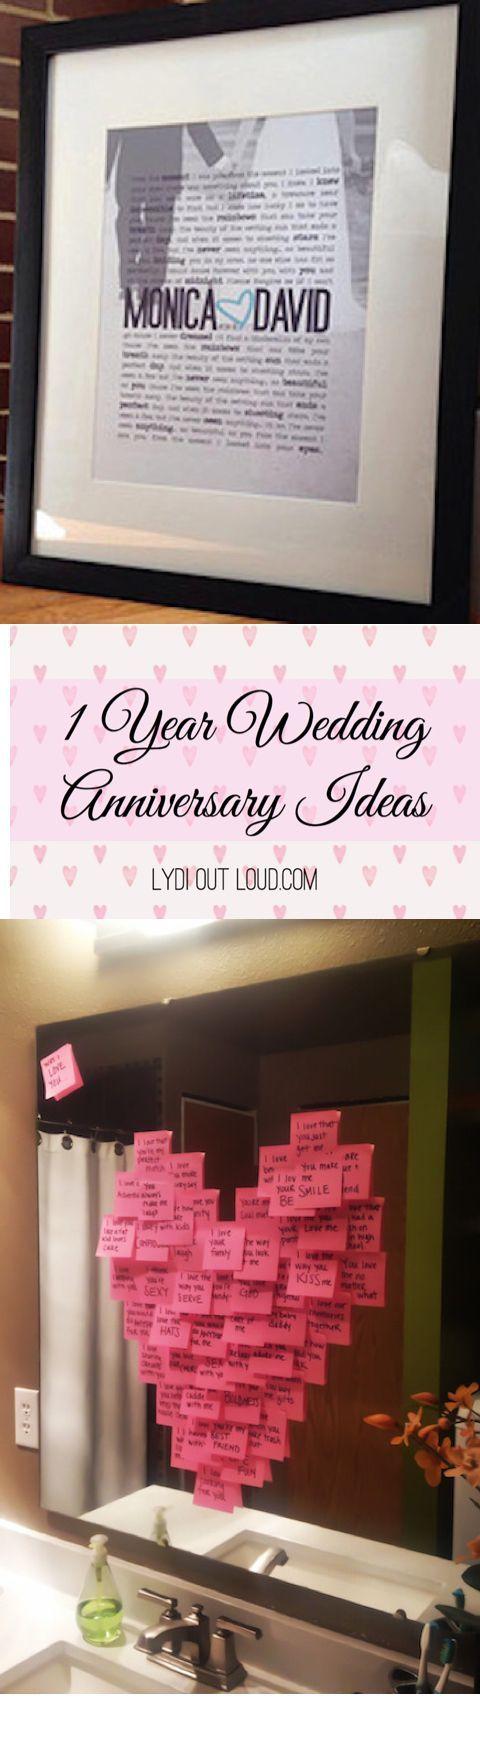 DIY Gifts Ideas : 1 Year Wedding Anniversary ideas - paper gift ...